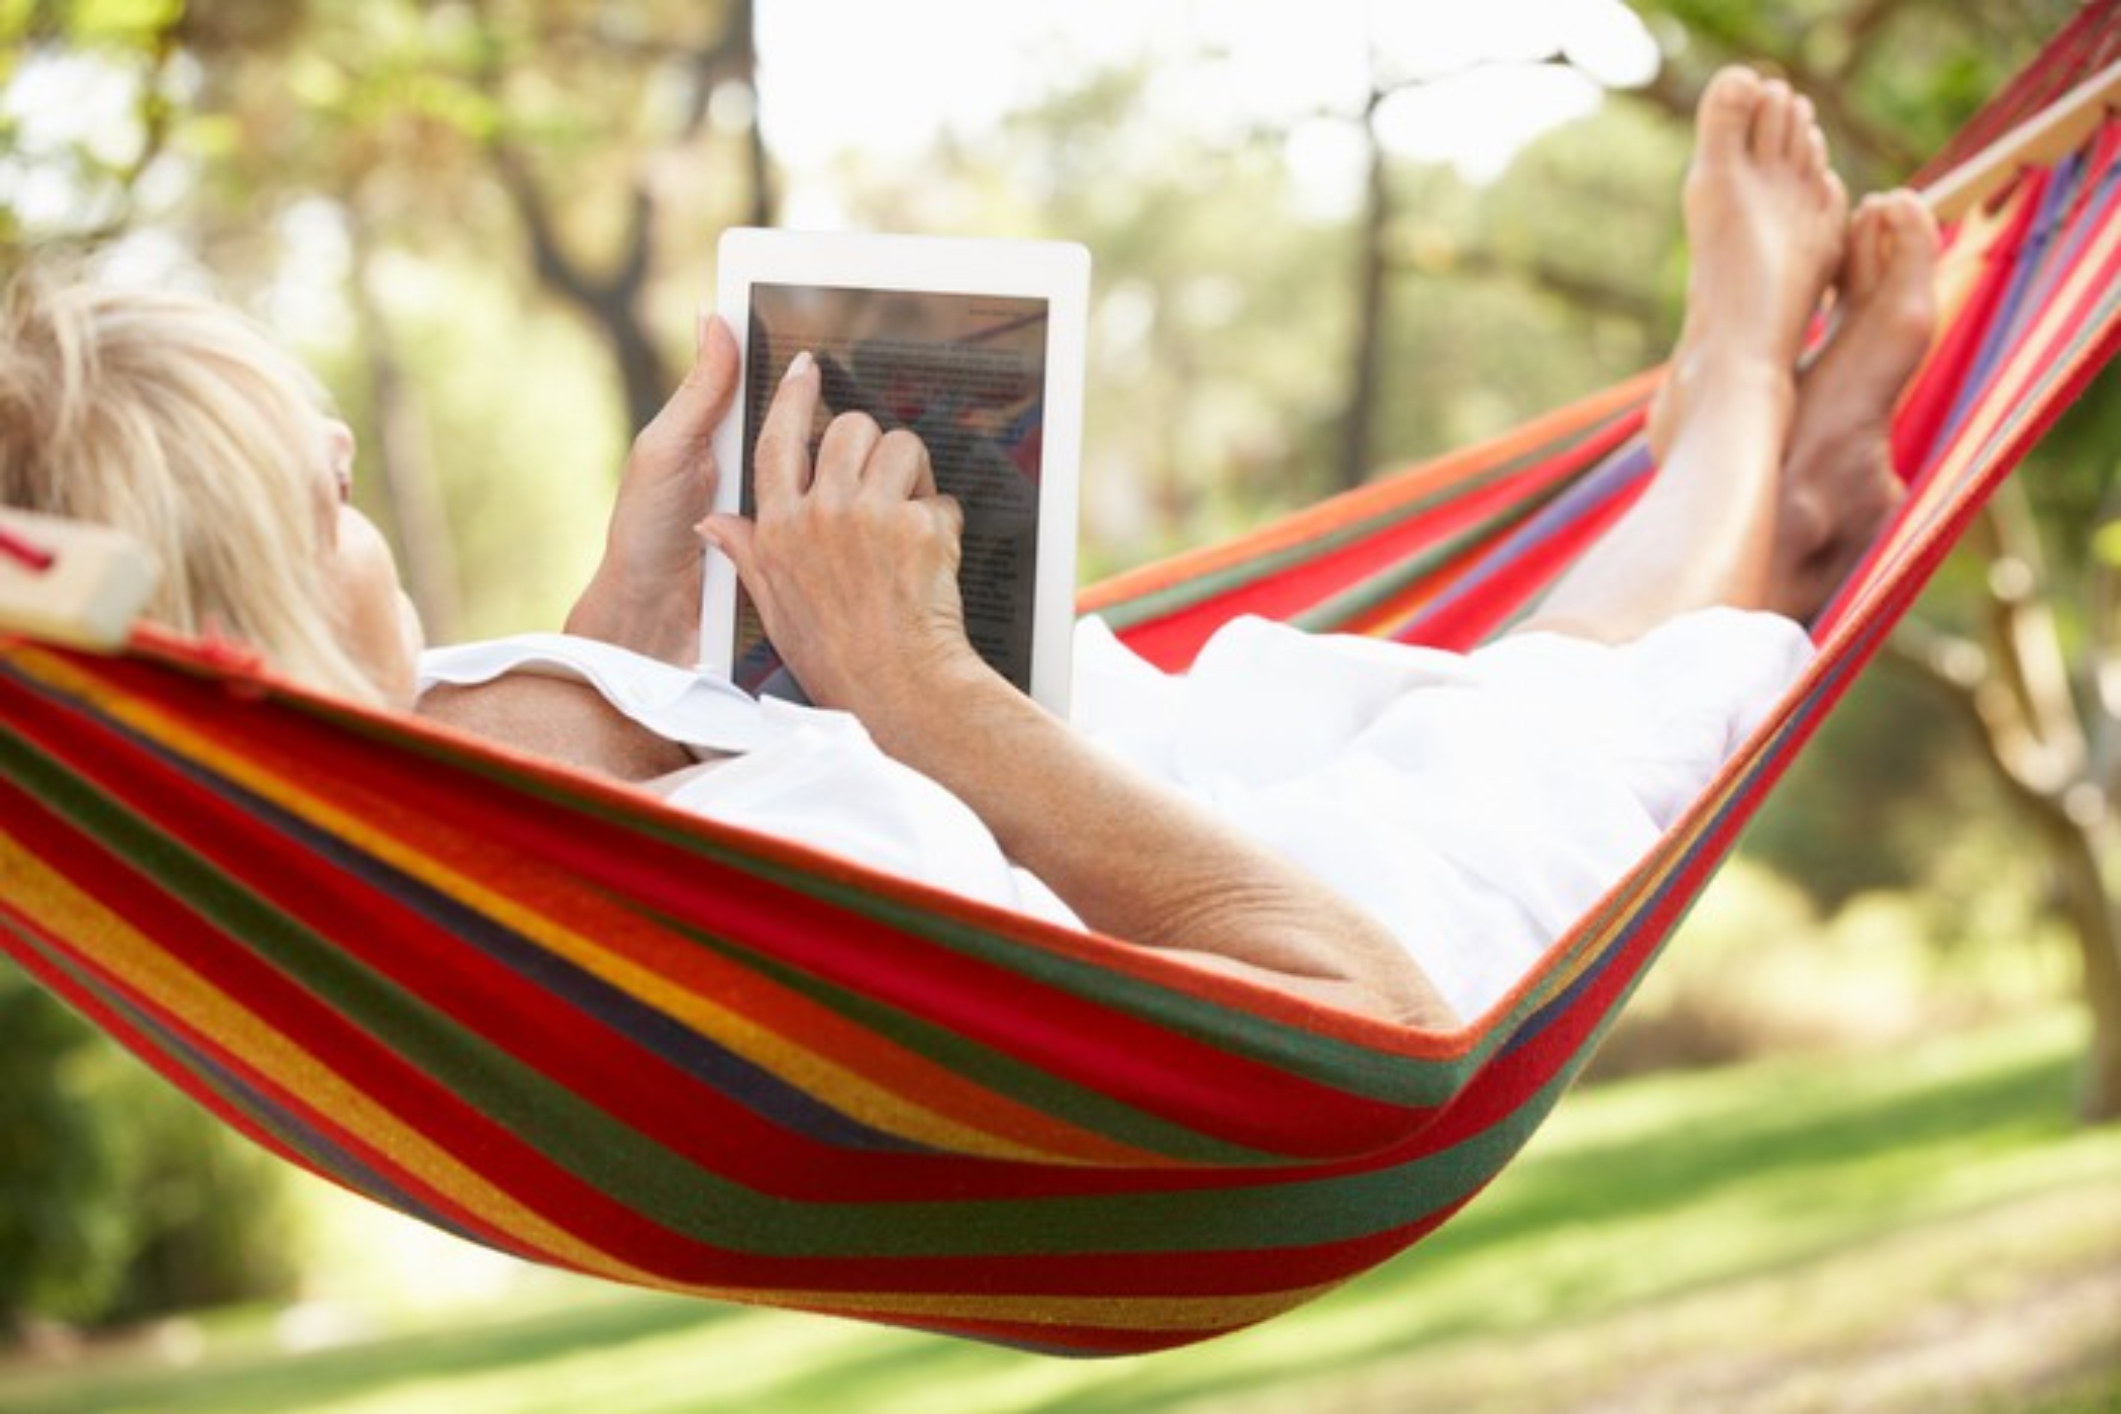 Woman lying in hammock reading on an e-reader